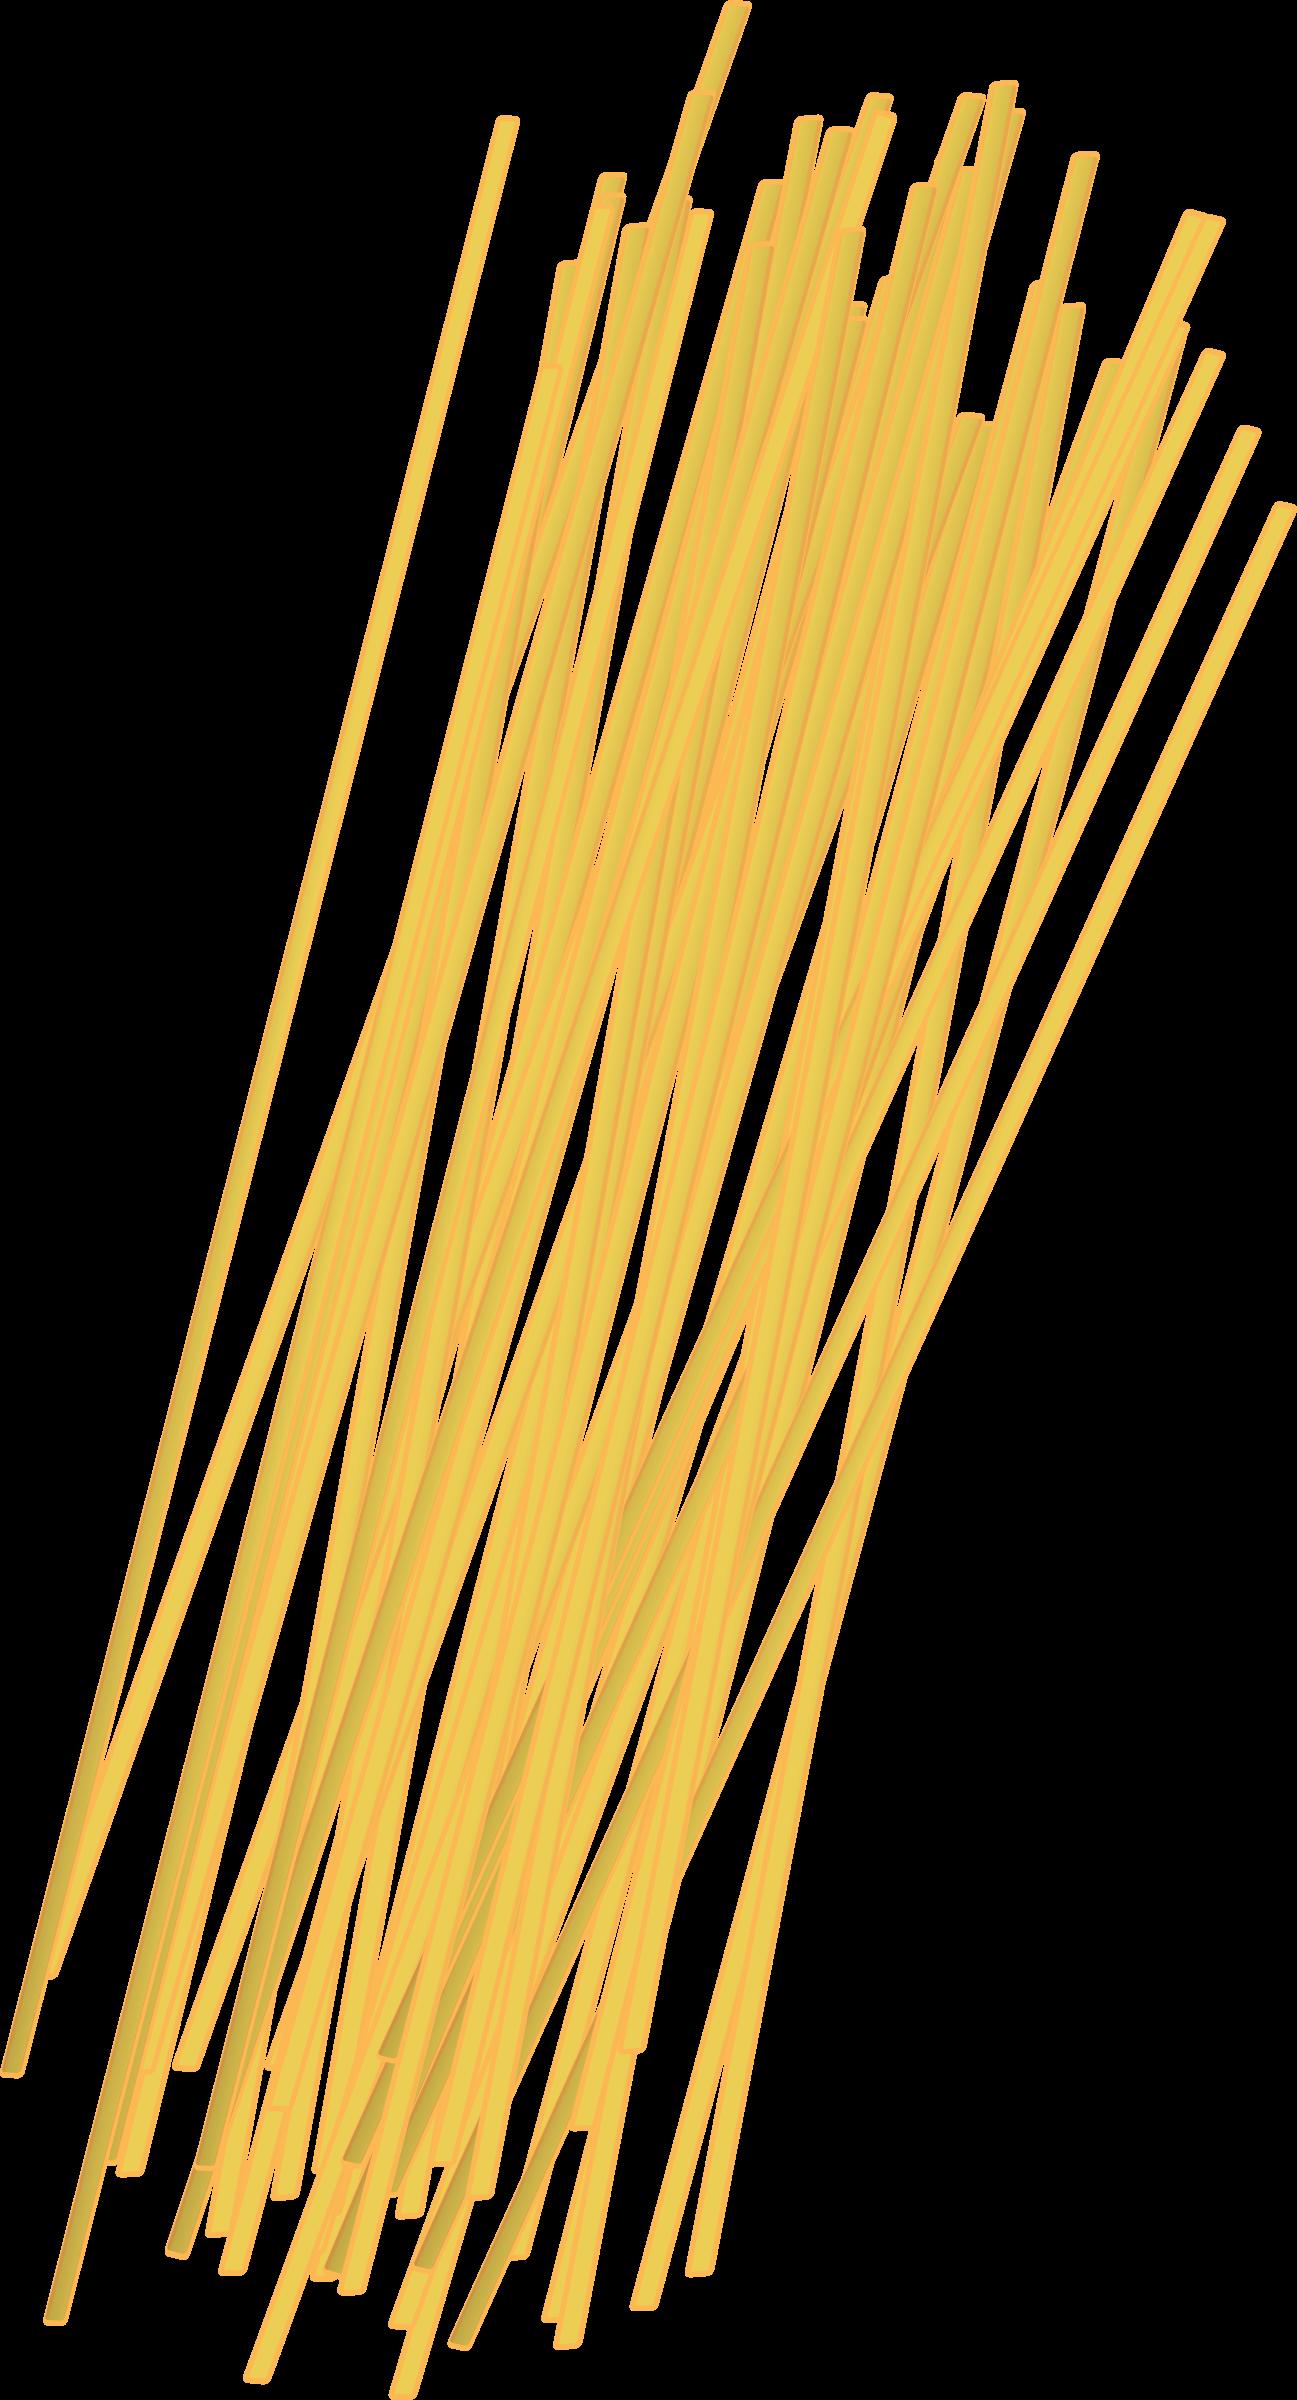 Noodles clipart pasta packet. Frames illustrations hd images